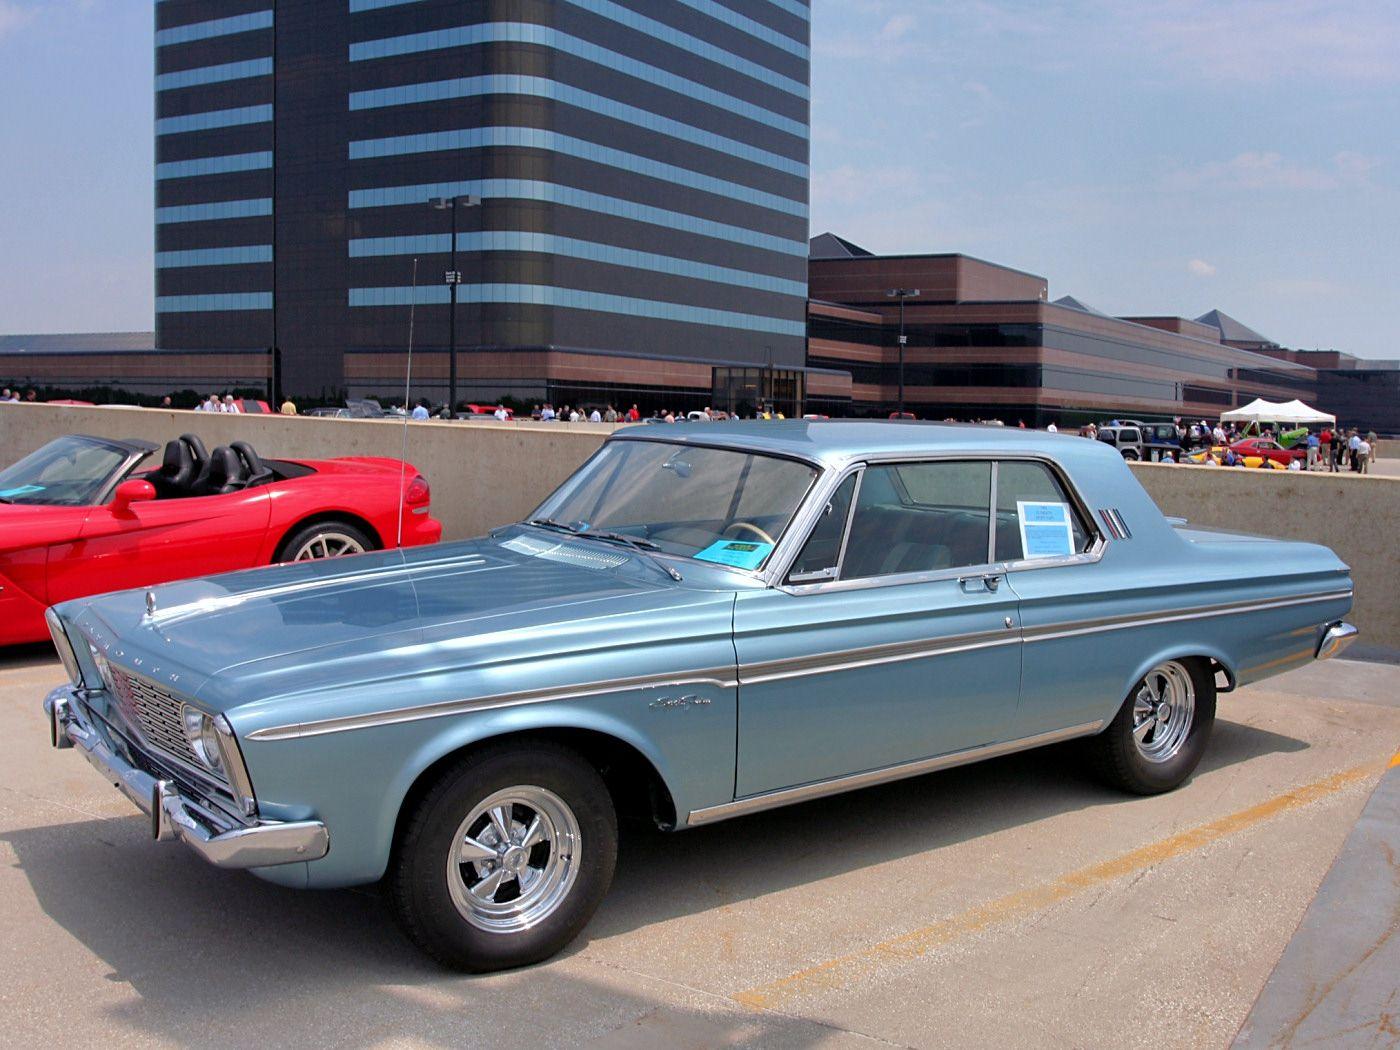 1963 Plymouth Sport Fury 2 Door Hardtop with Custom Wheels